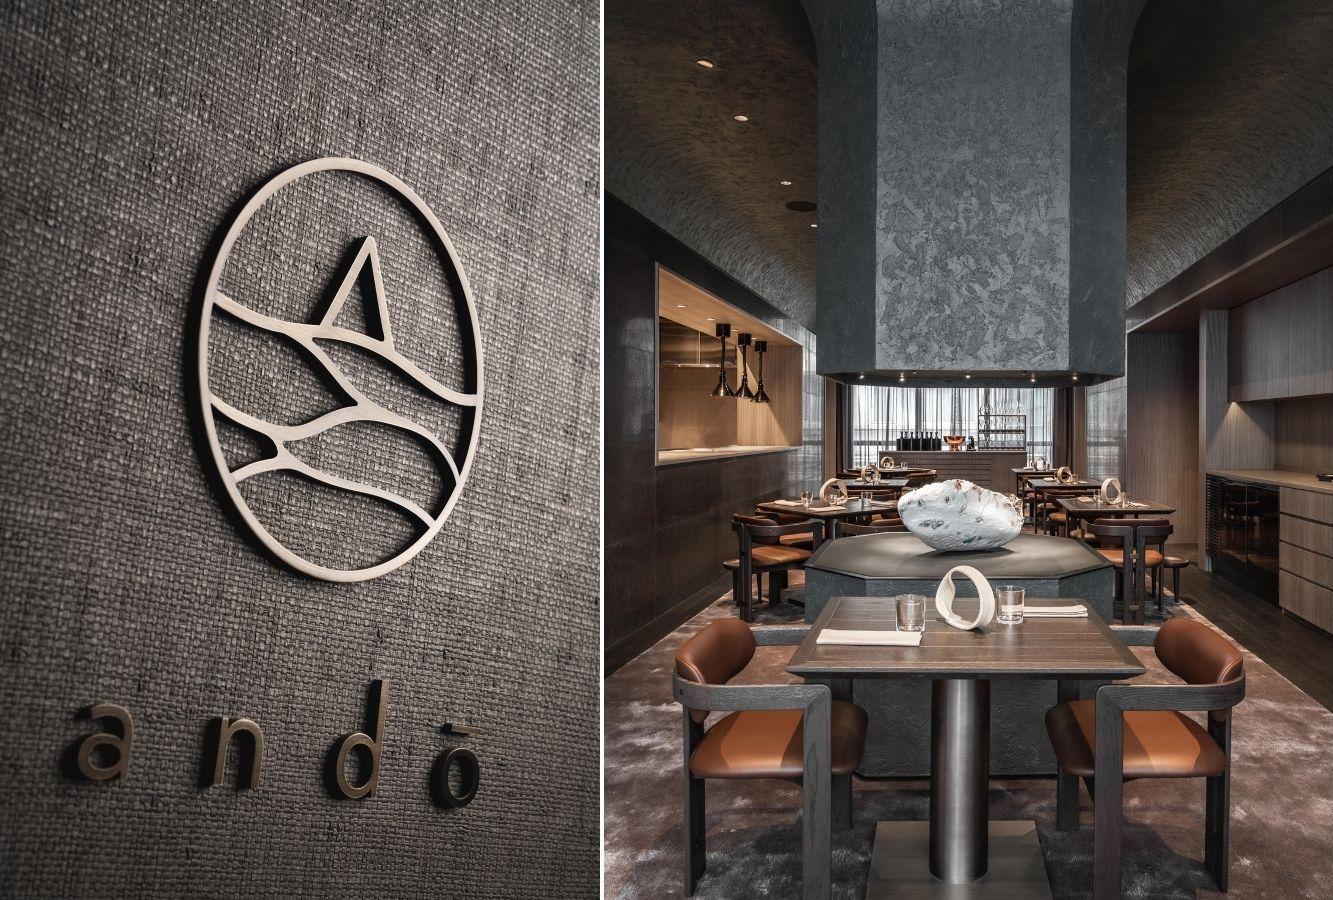 Ando's logo and interior. (Photo: Ando)